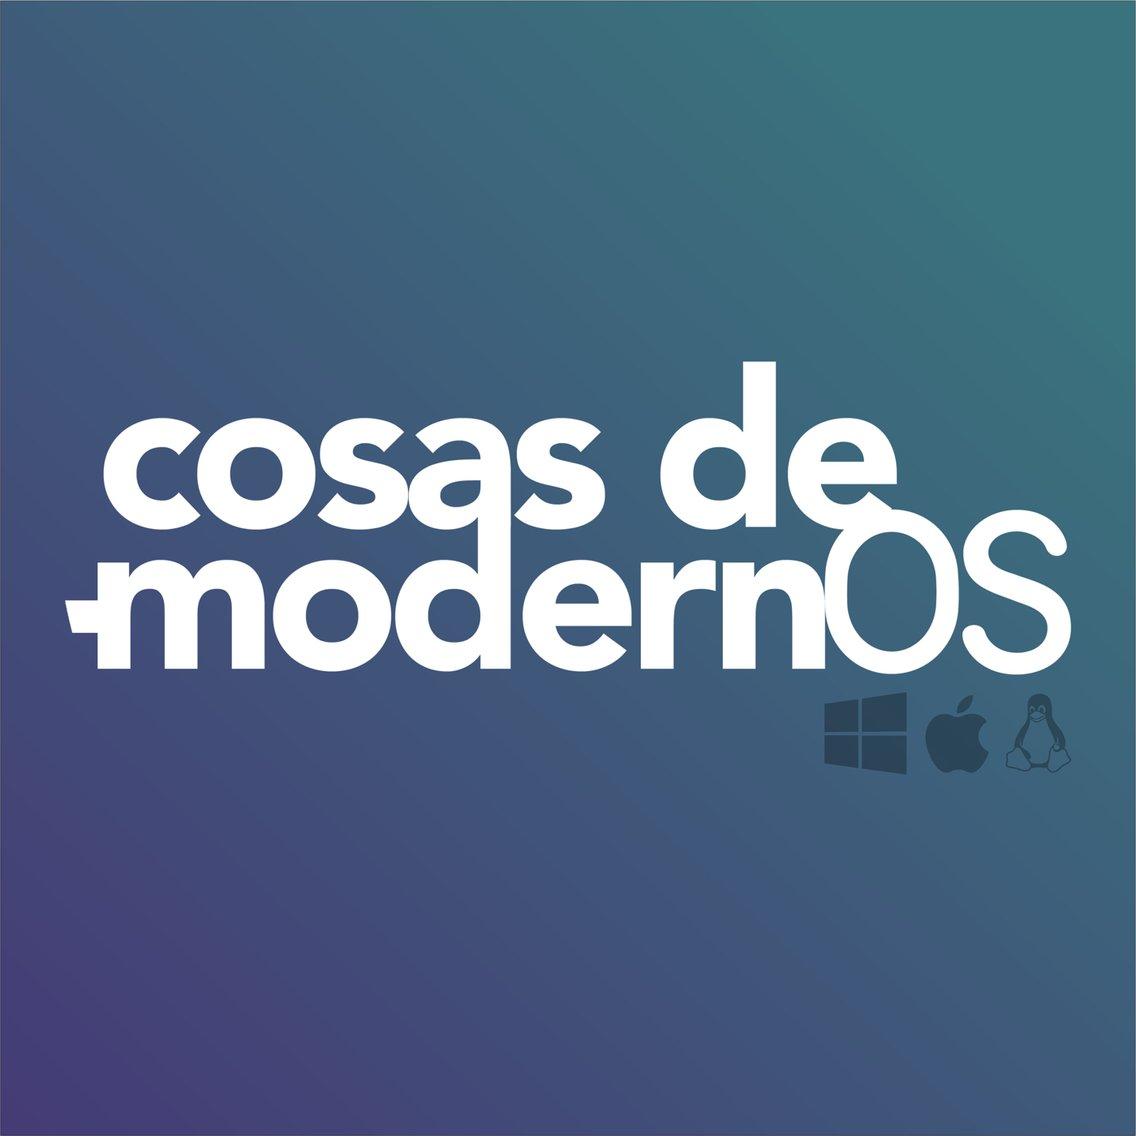 Cosas de modernOS - immagine di copertina